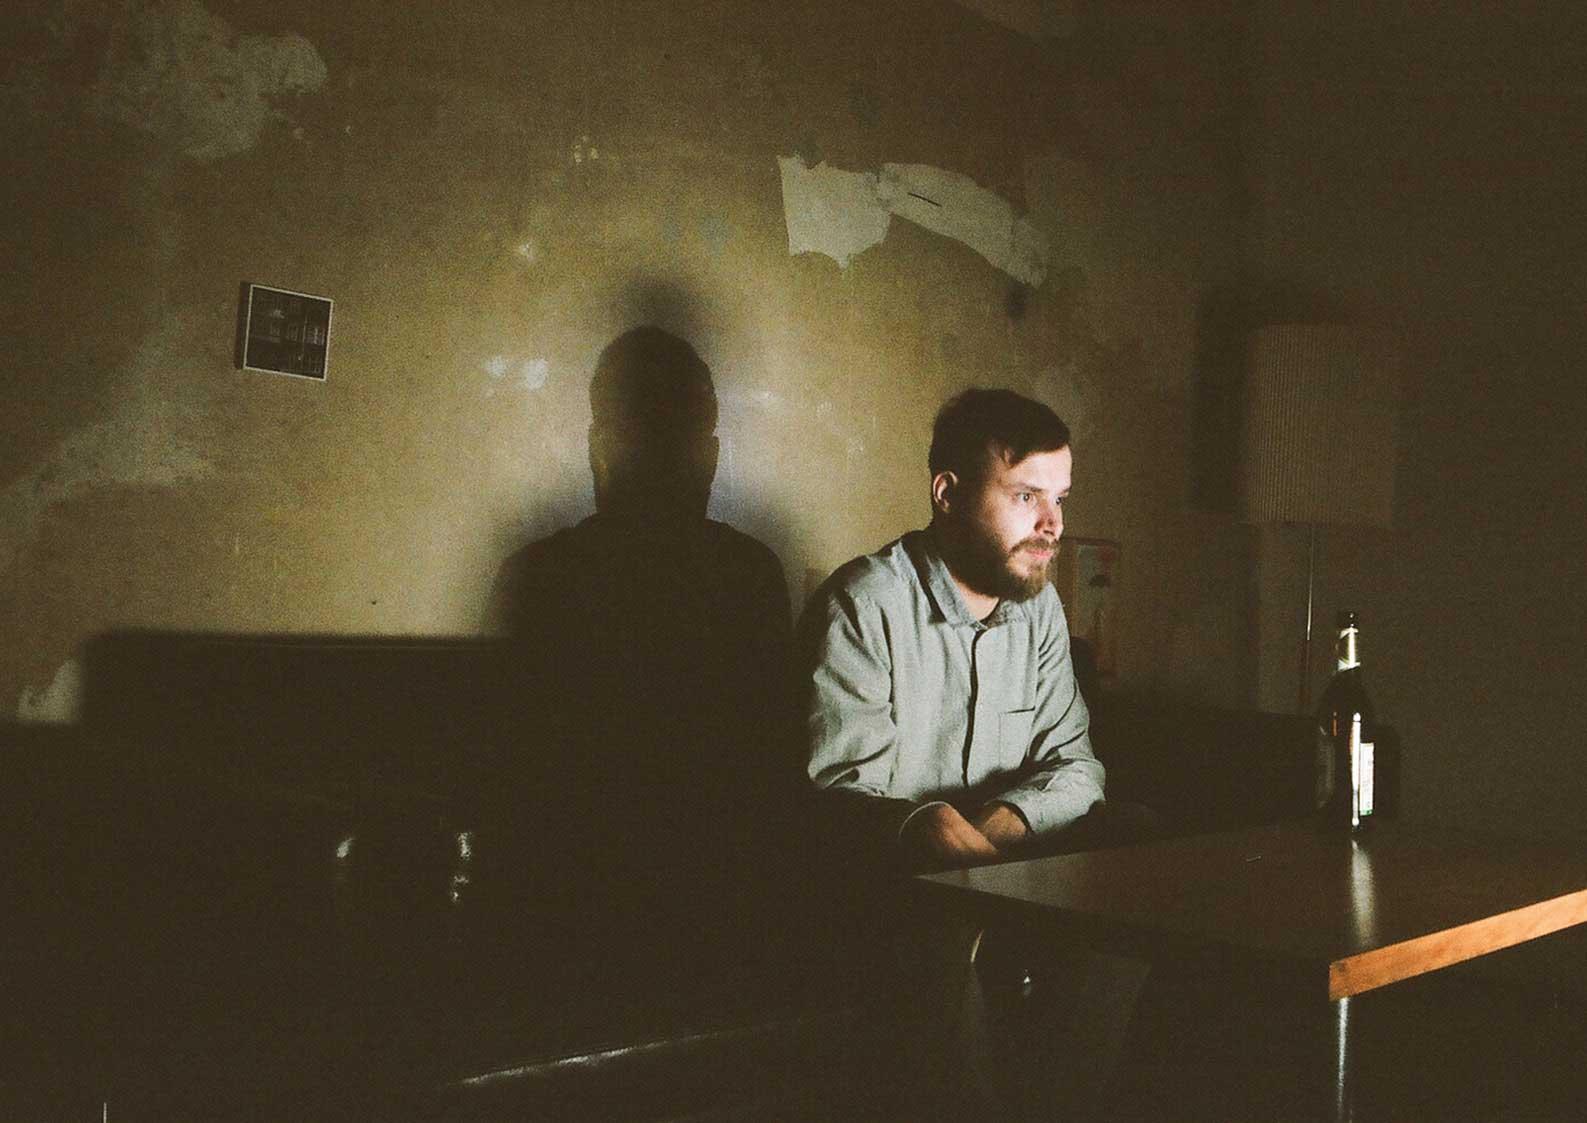 MYP-Magazine-18-Submission-Hannes-Lippert-Urknall